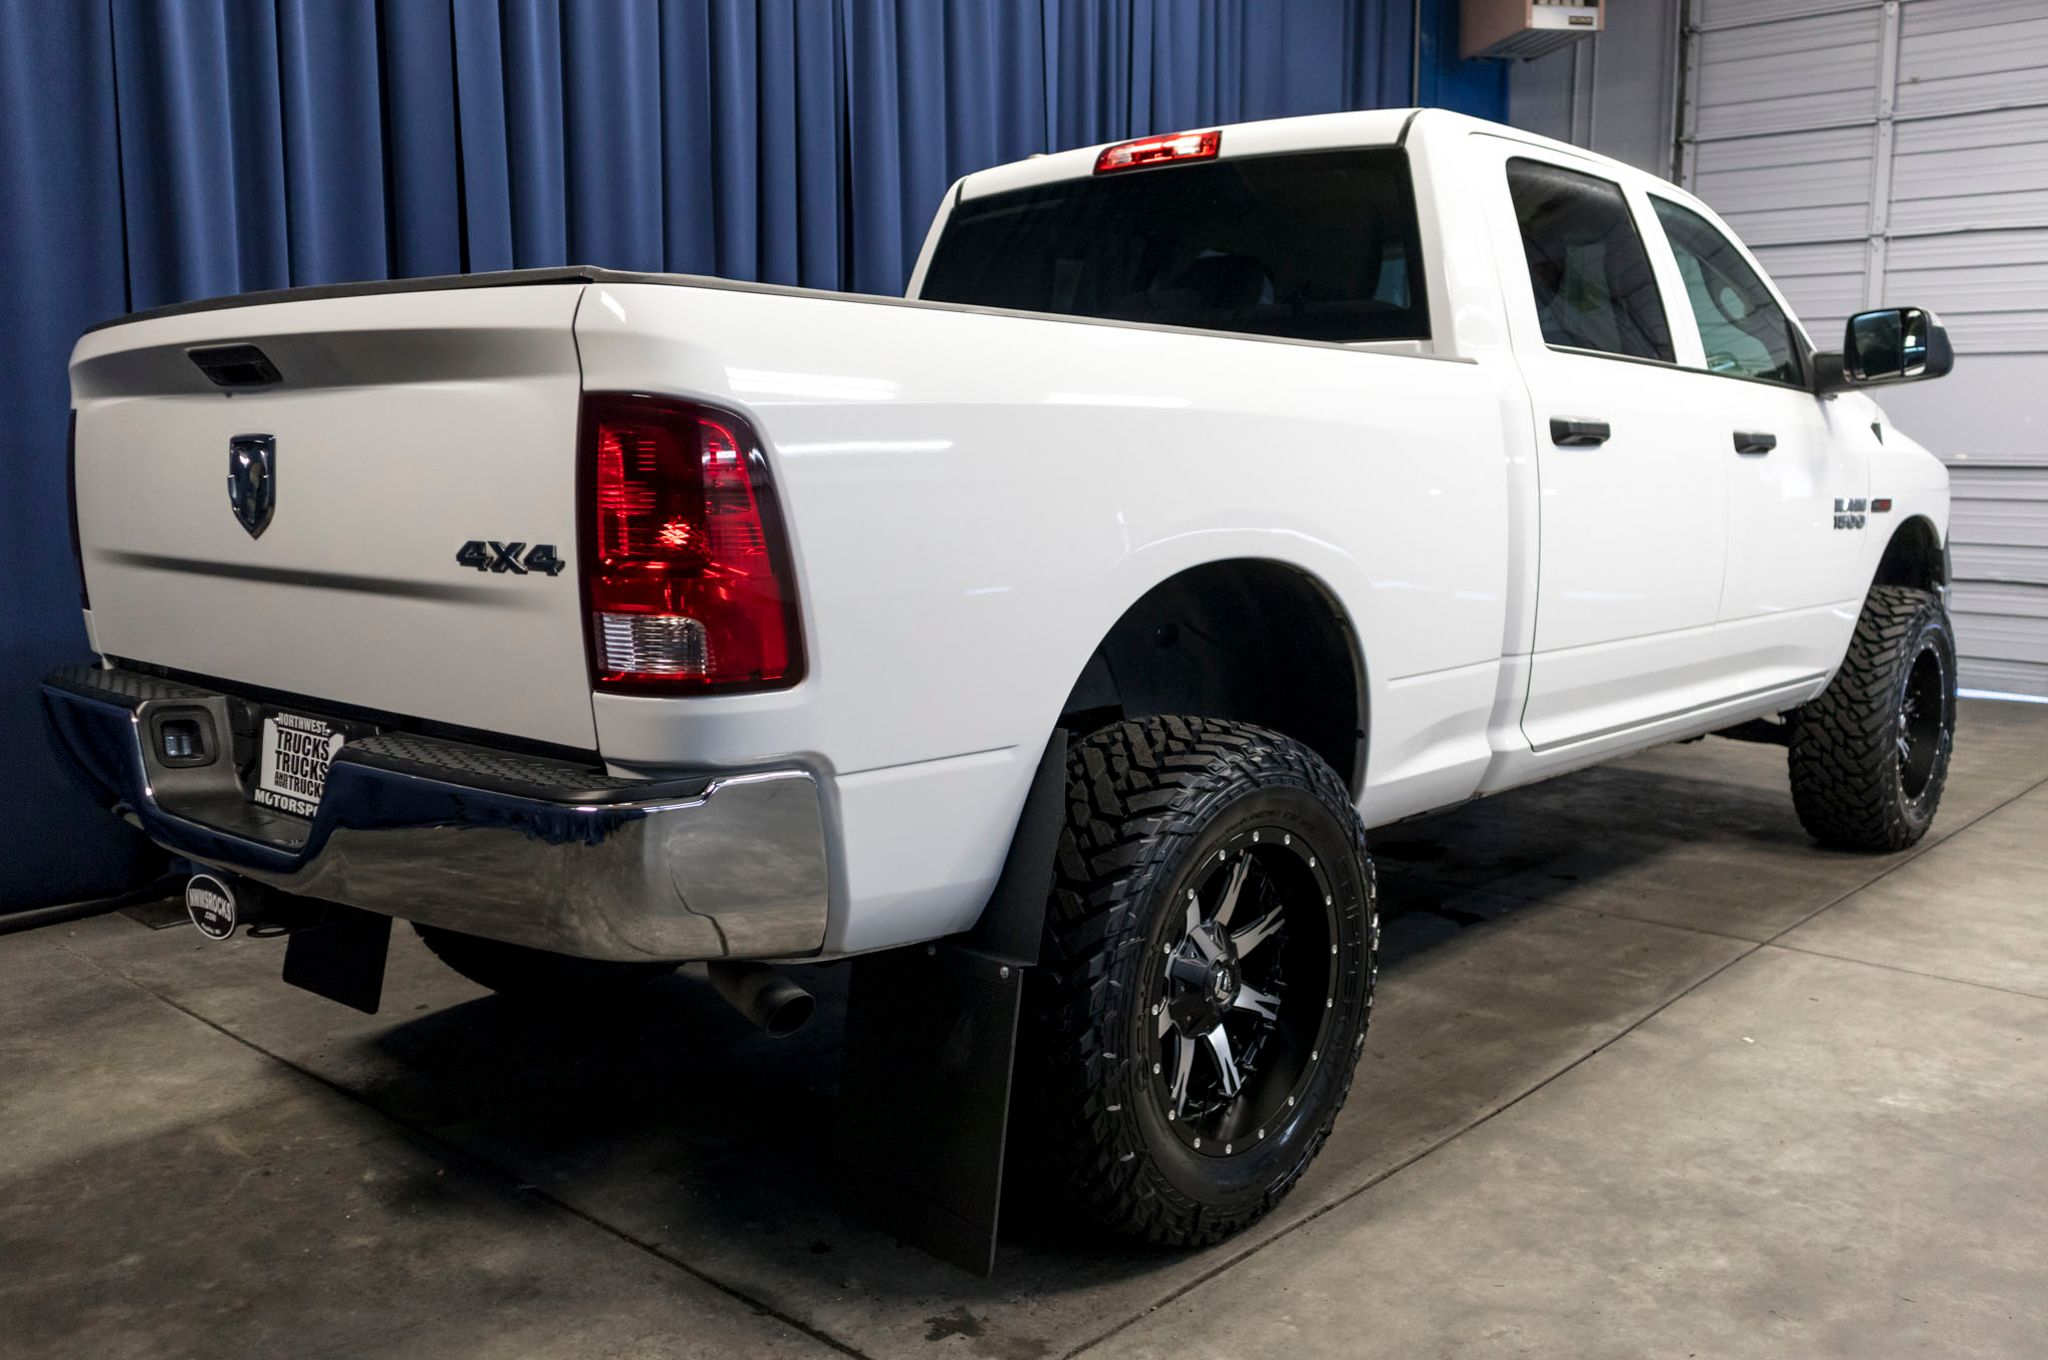 used lifted 2014 dodge ram 1500 tradesman 4x4 diesel truck for sale 47280. Black Bedroom Furniture Sets. Home Design Ideas